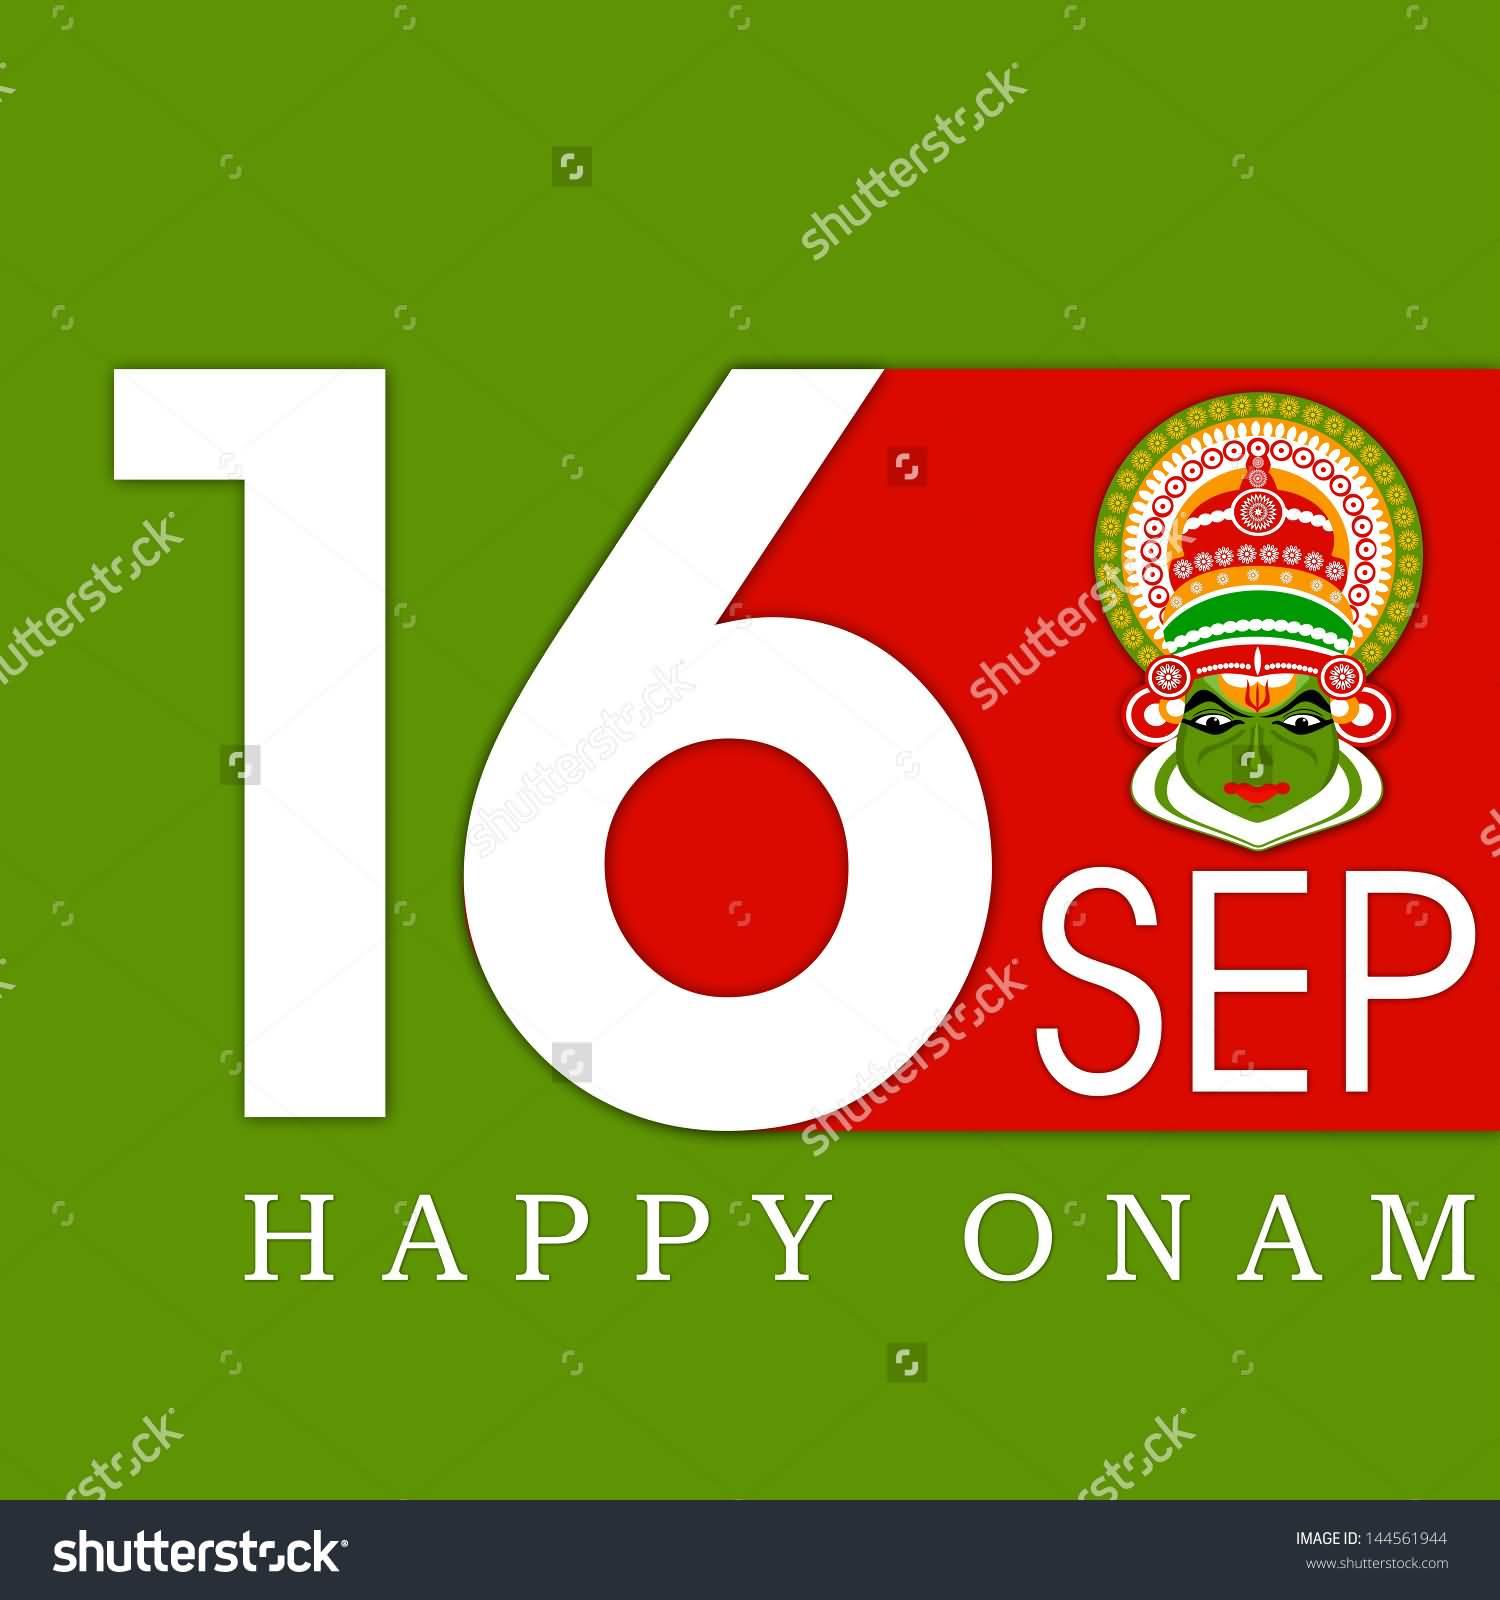 16 Sep Happy Onam Greeting Card